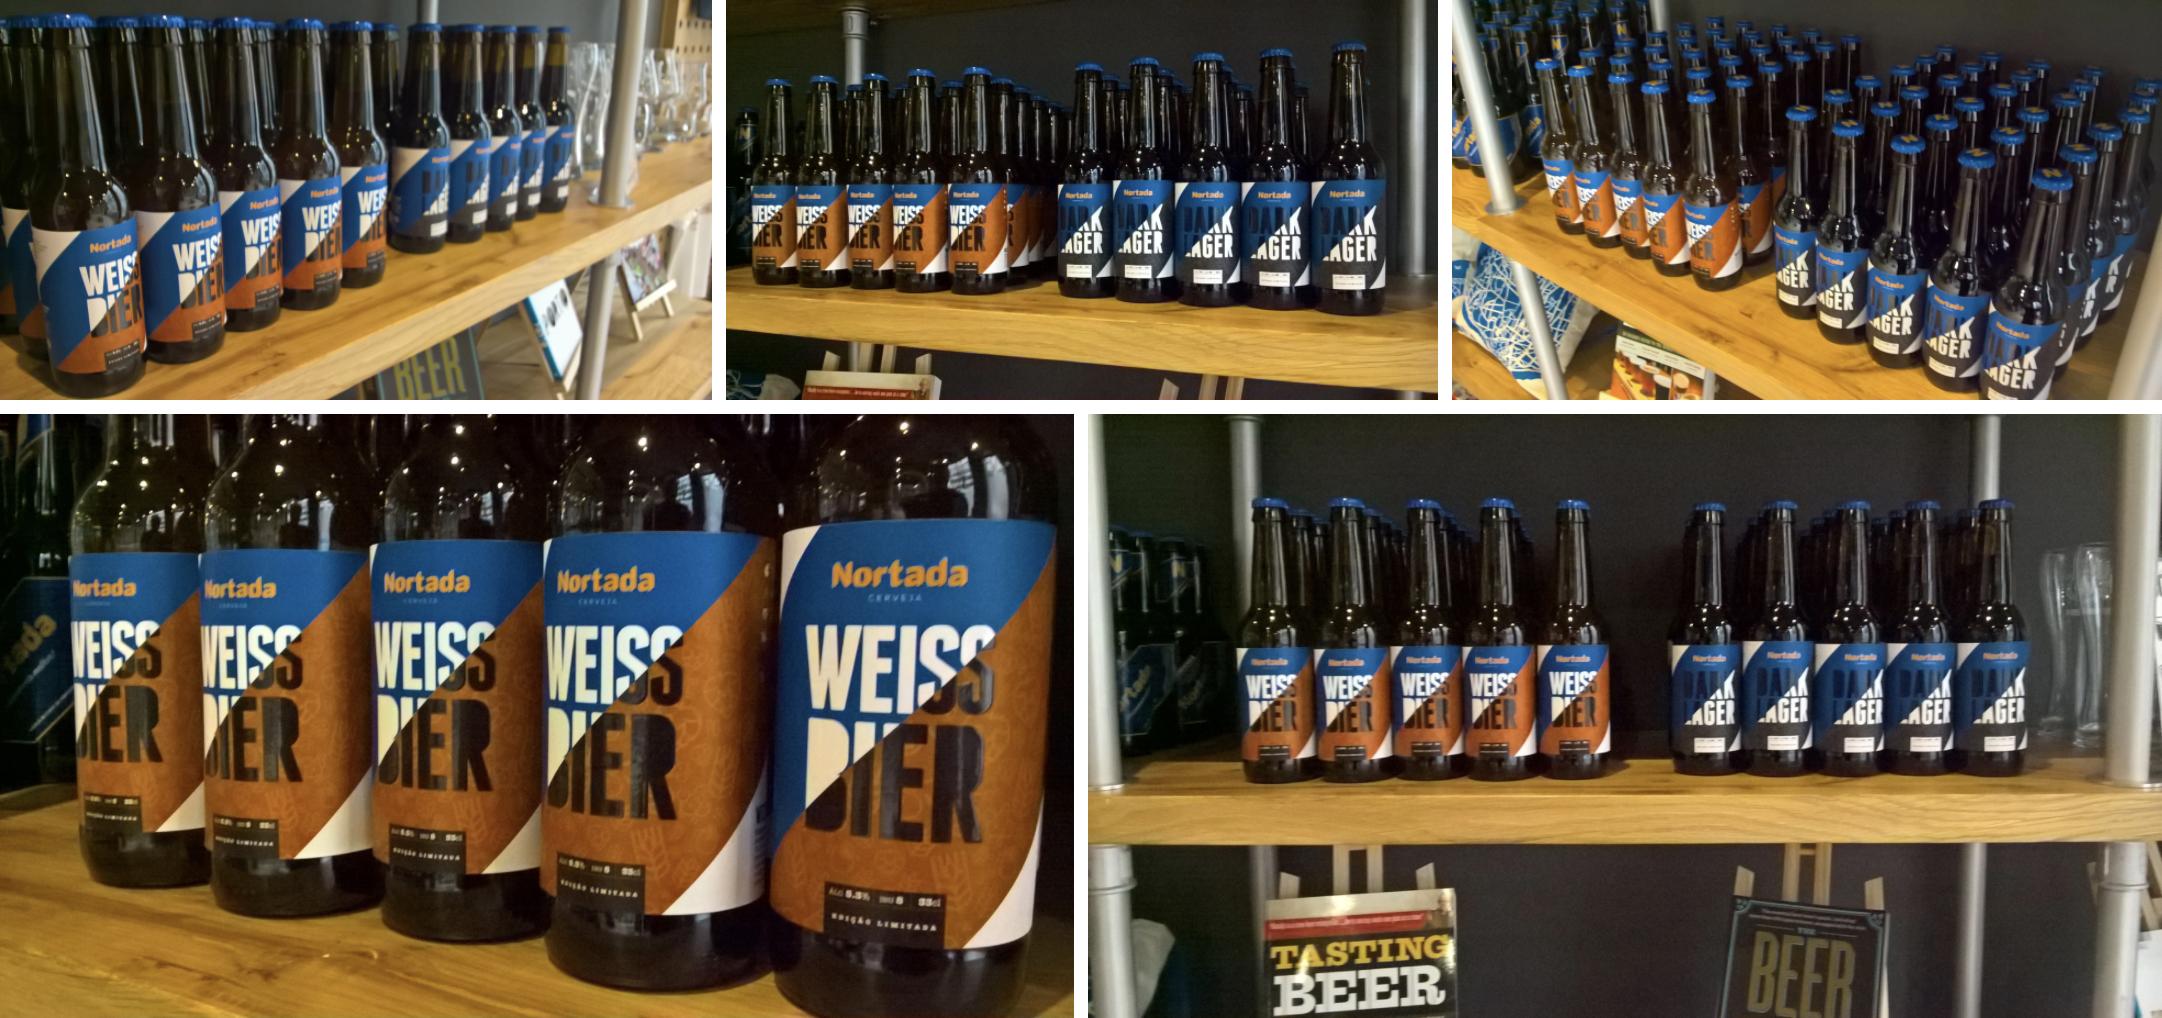 Nortada - Regional craft beer from Porto Portugal / World Brand & Packaging Design Society